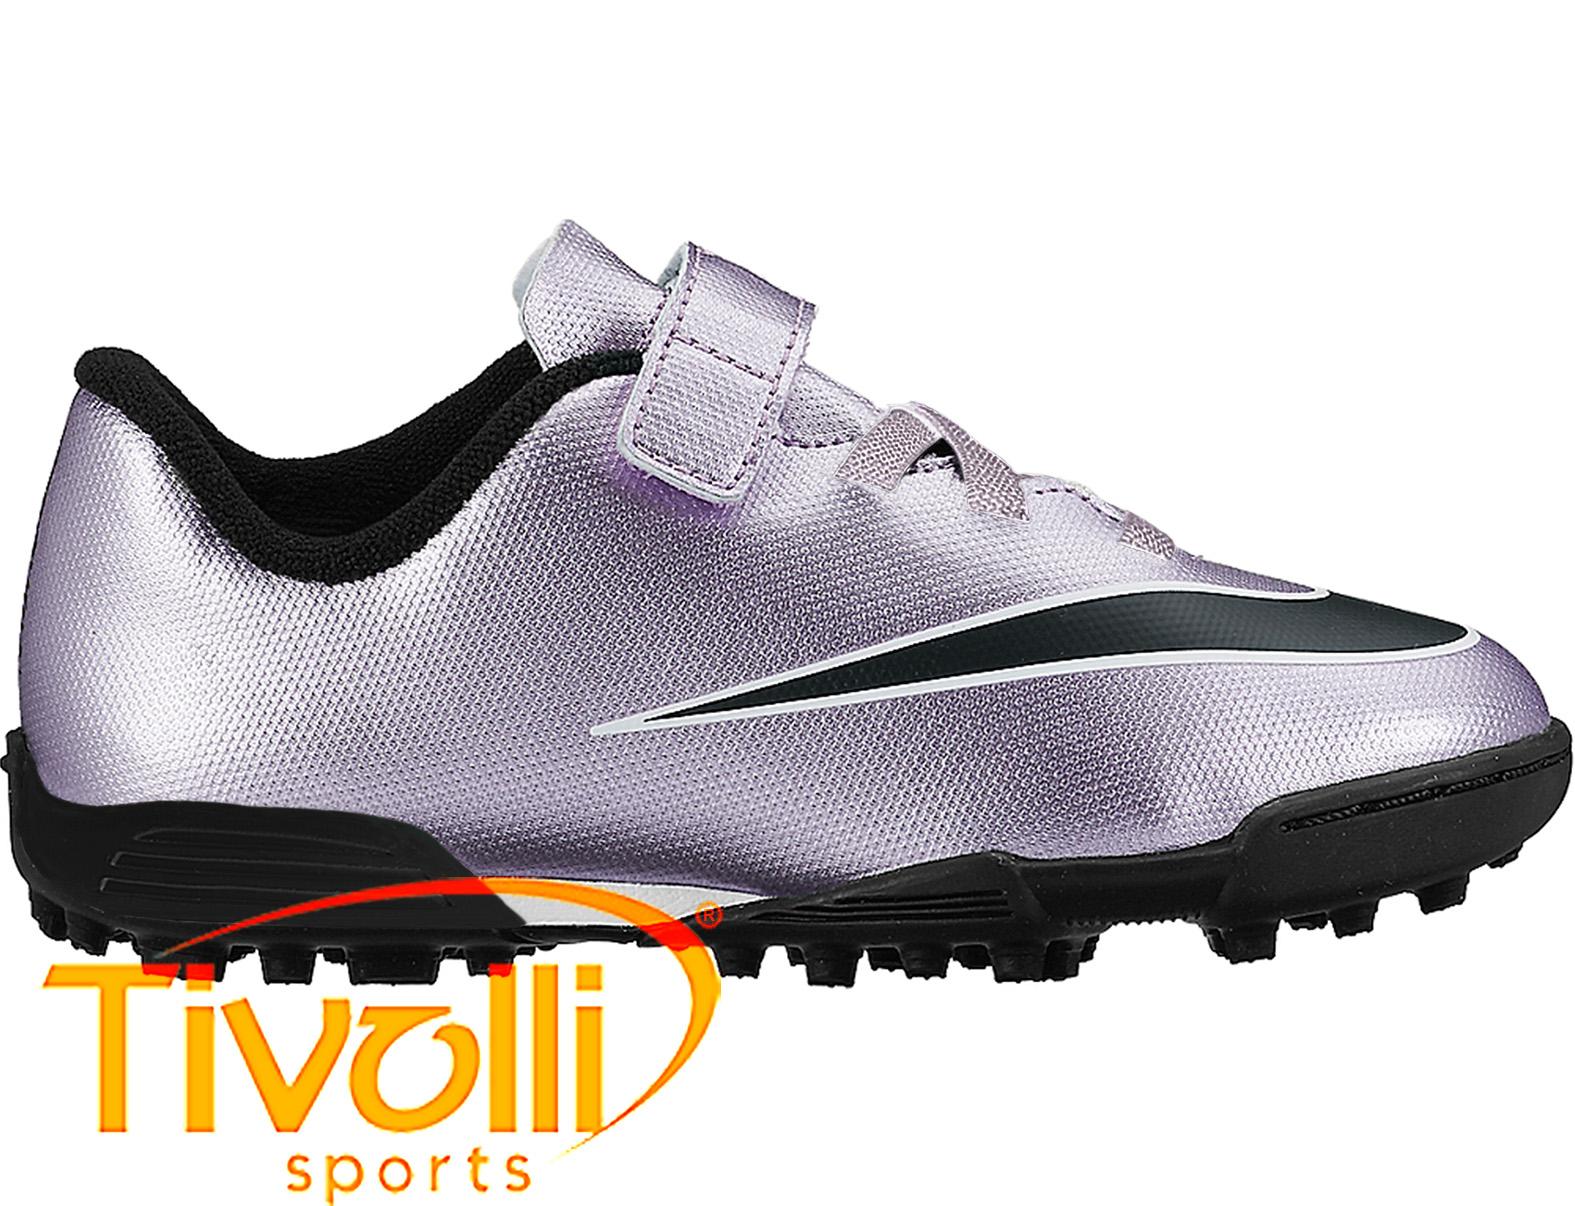 Chuteira Nike Mercurial Vortex II TF Society Infantil     2847eb4c4de24